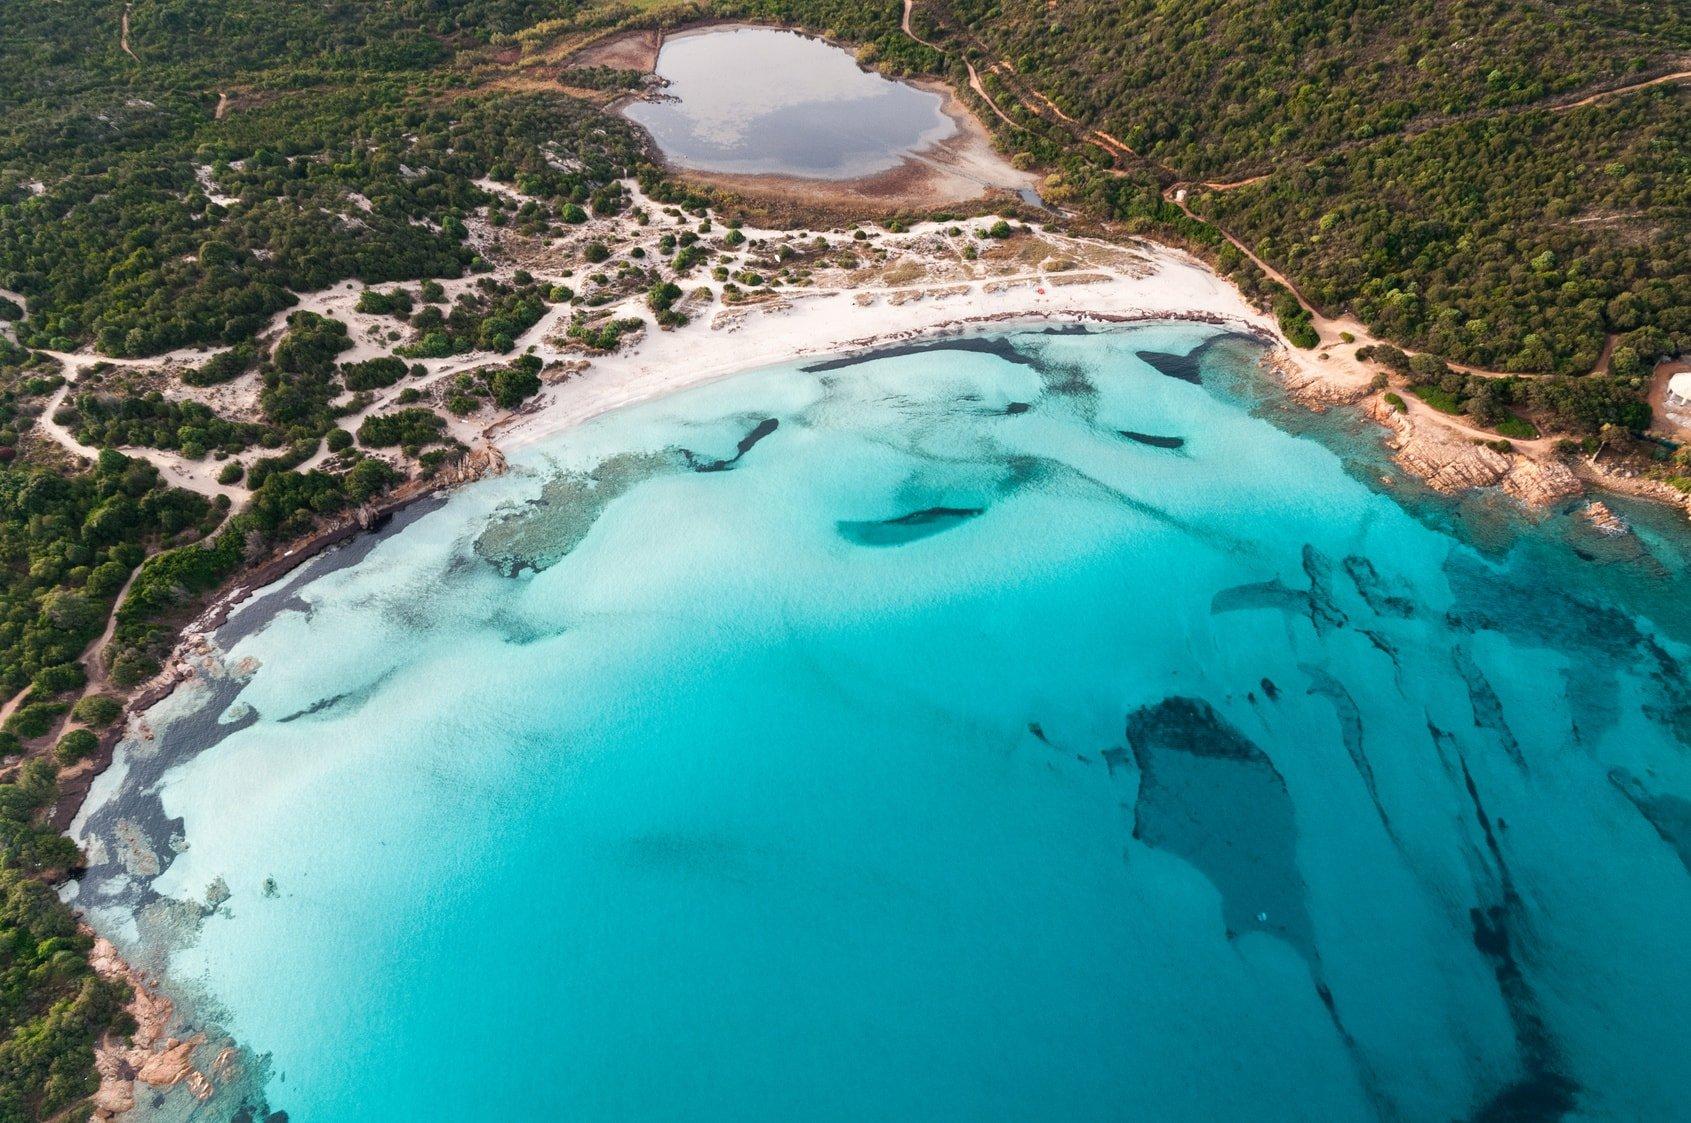 corsica-yacht-charter-sardinia-emerald-coast-sailing-itinerary-route-cruise-14-days-2-weeks